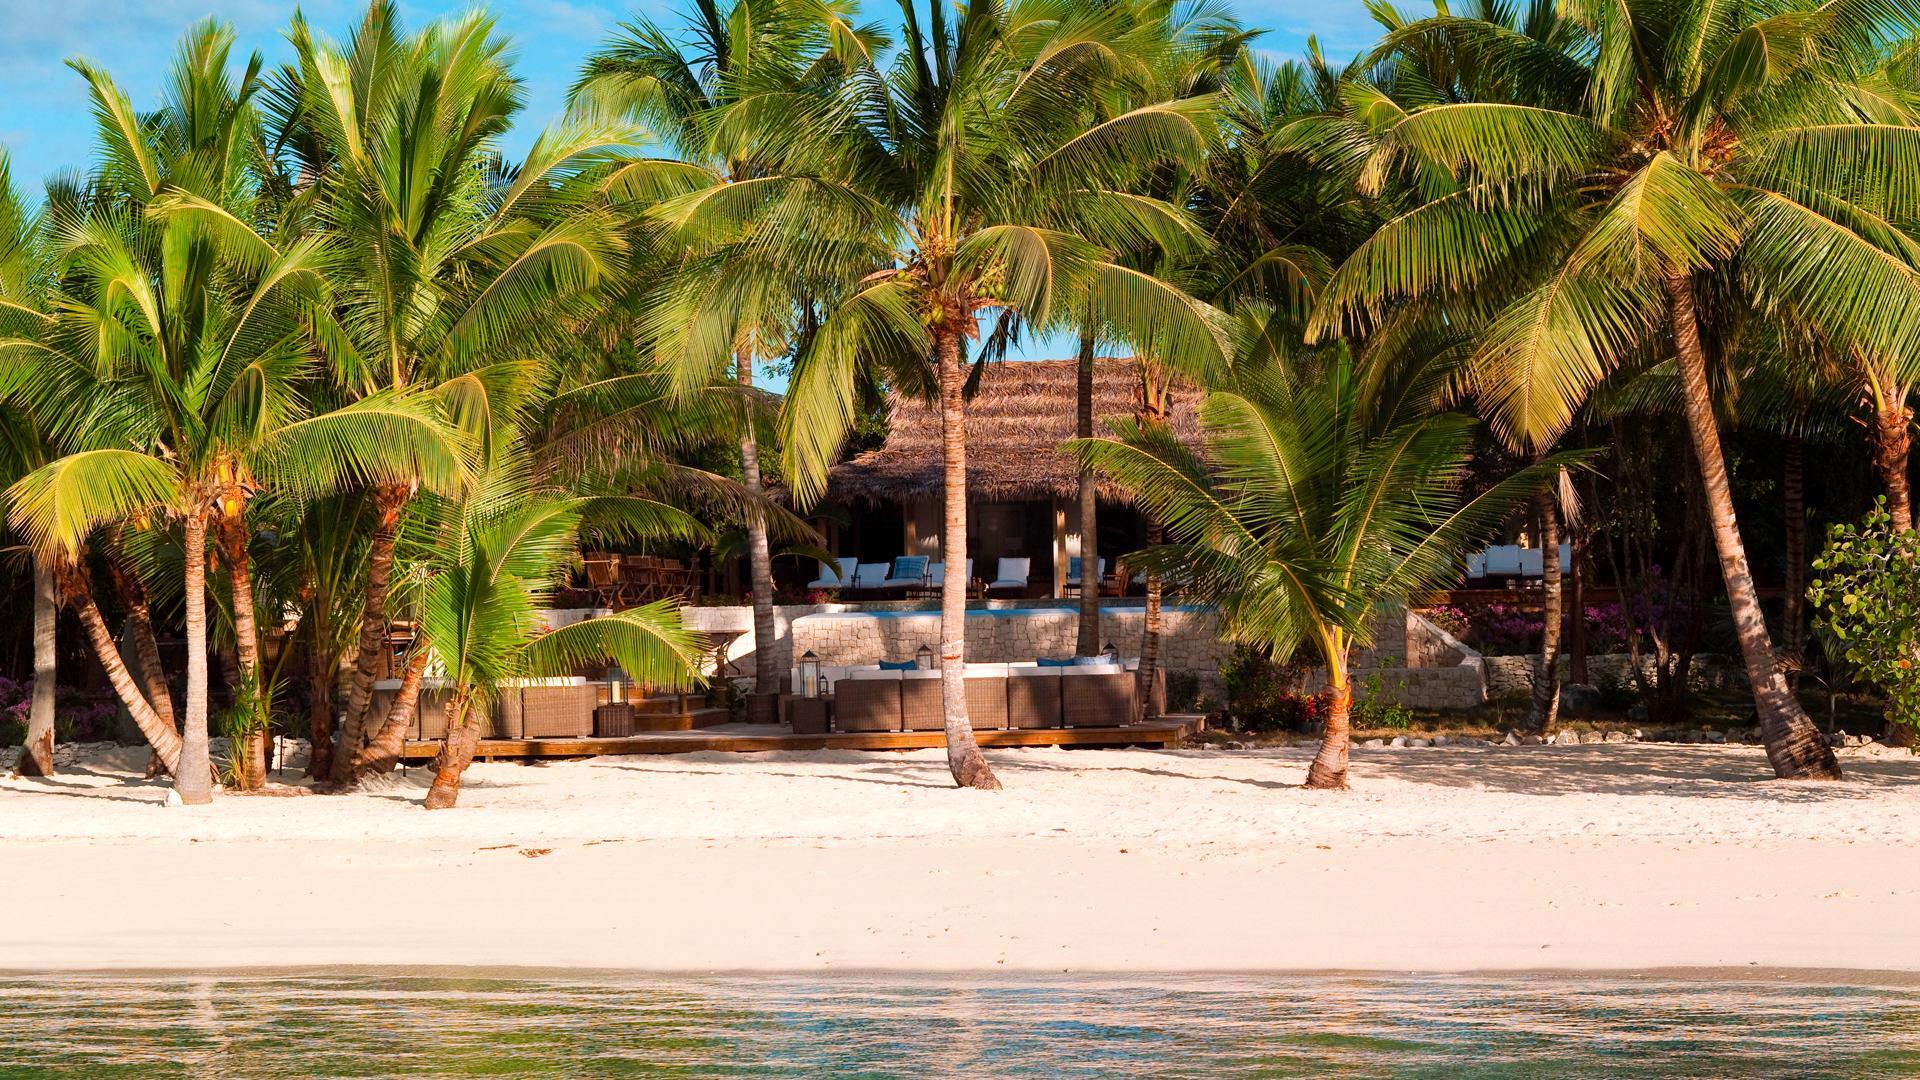 Luxury hotel tiamo resorts south andros bahamas luxury dream hotels publicscrutiny Images